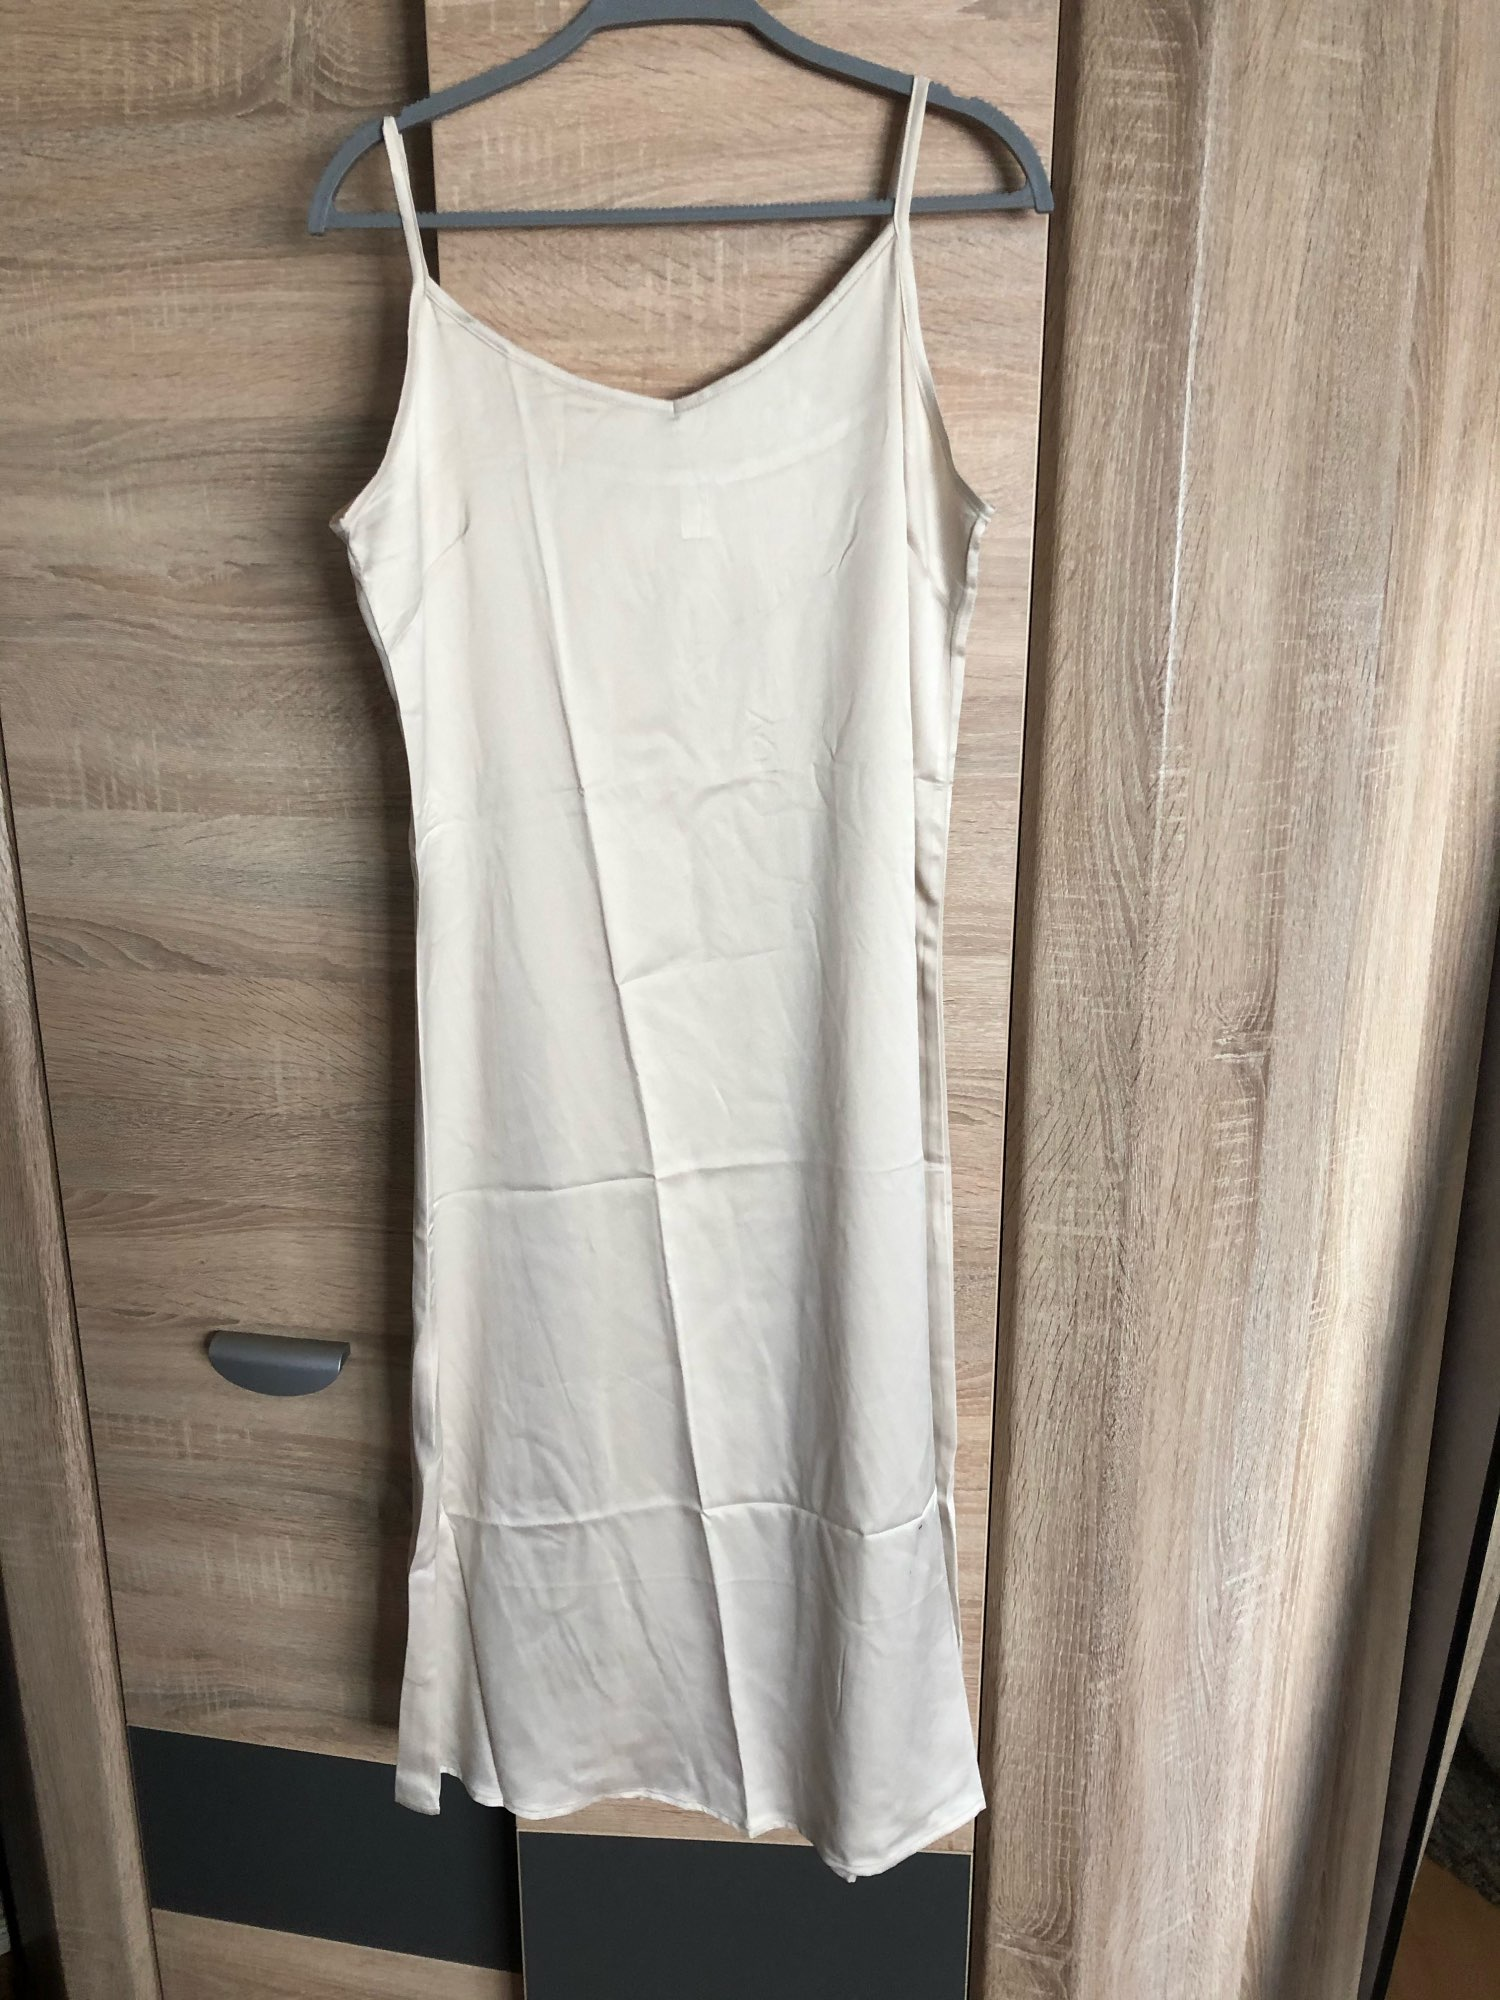 Fashion High Quality Women's Dress Summer Spaghetti Satin Long Woman Dress Very Soft Smooth Plus Size S 4XL M30262|Dresses|   - AliExpress